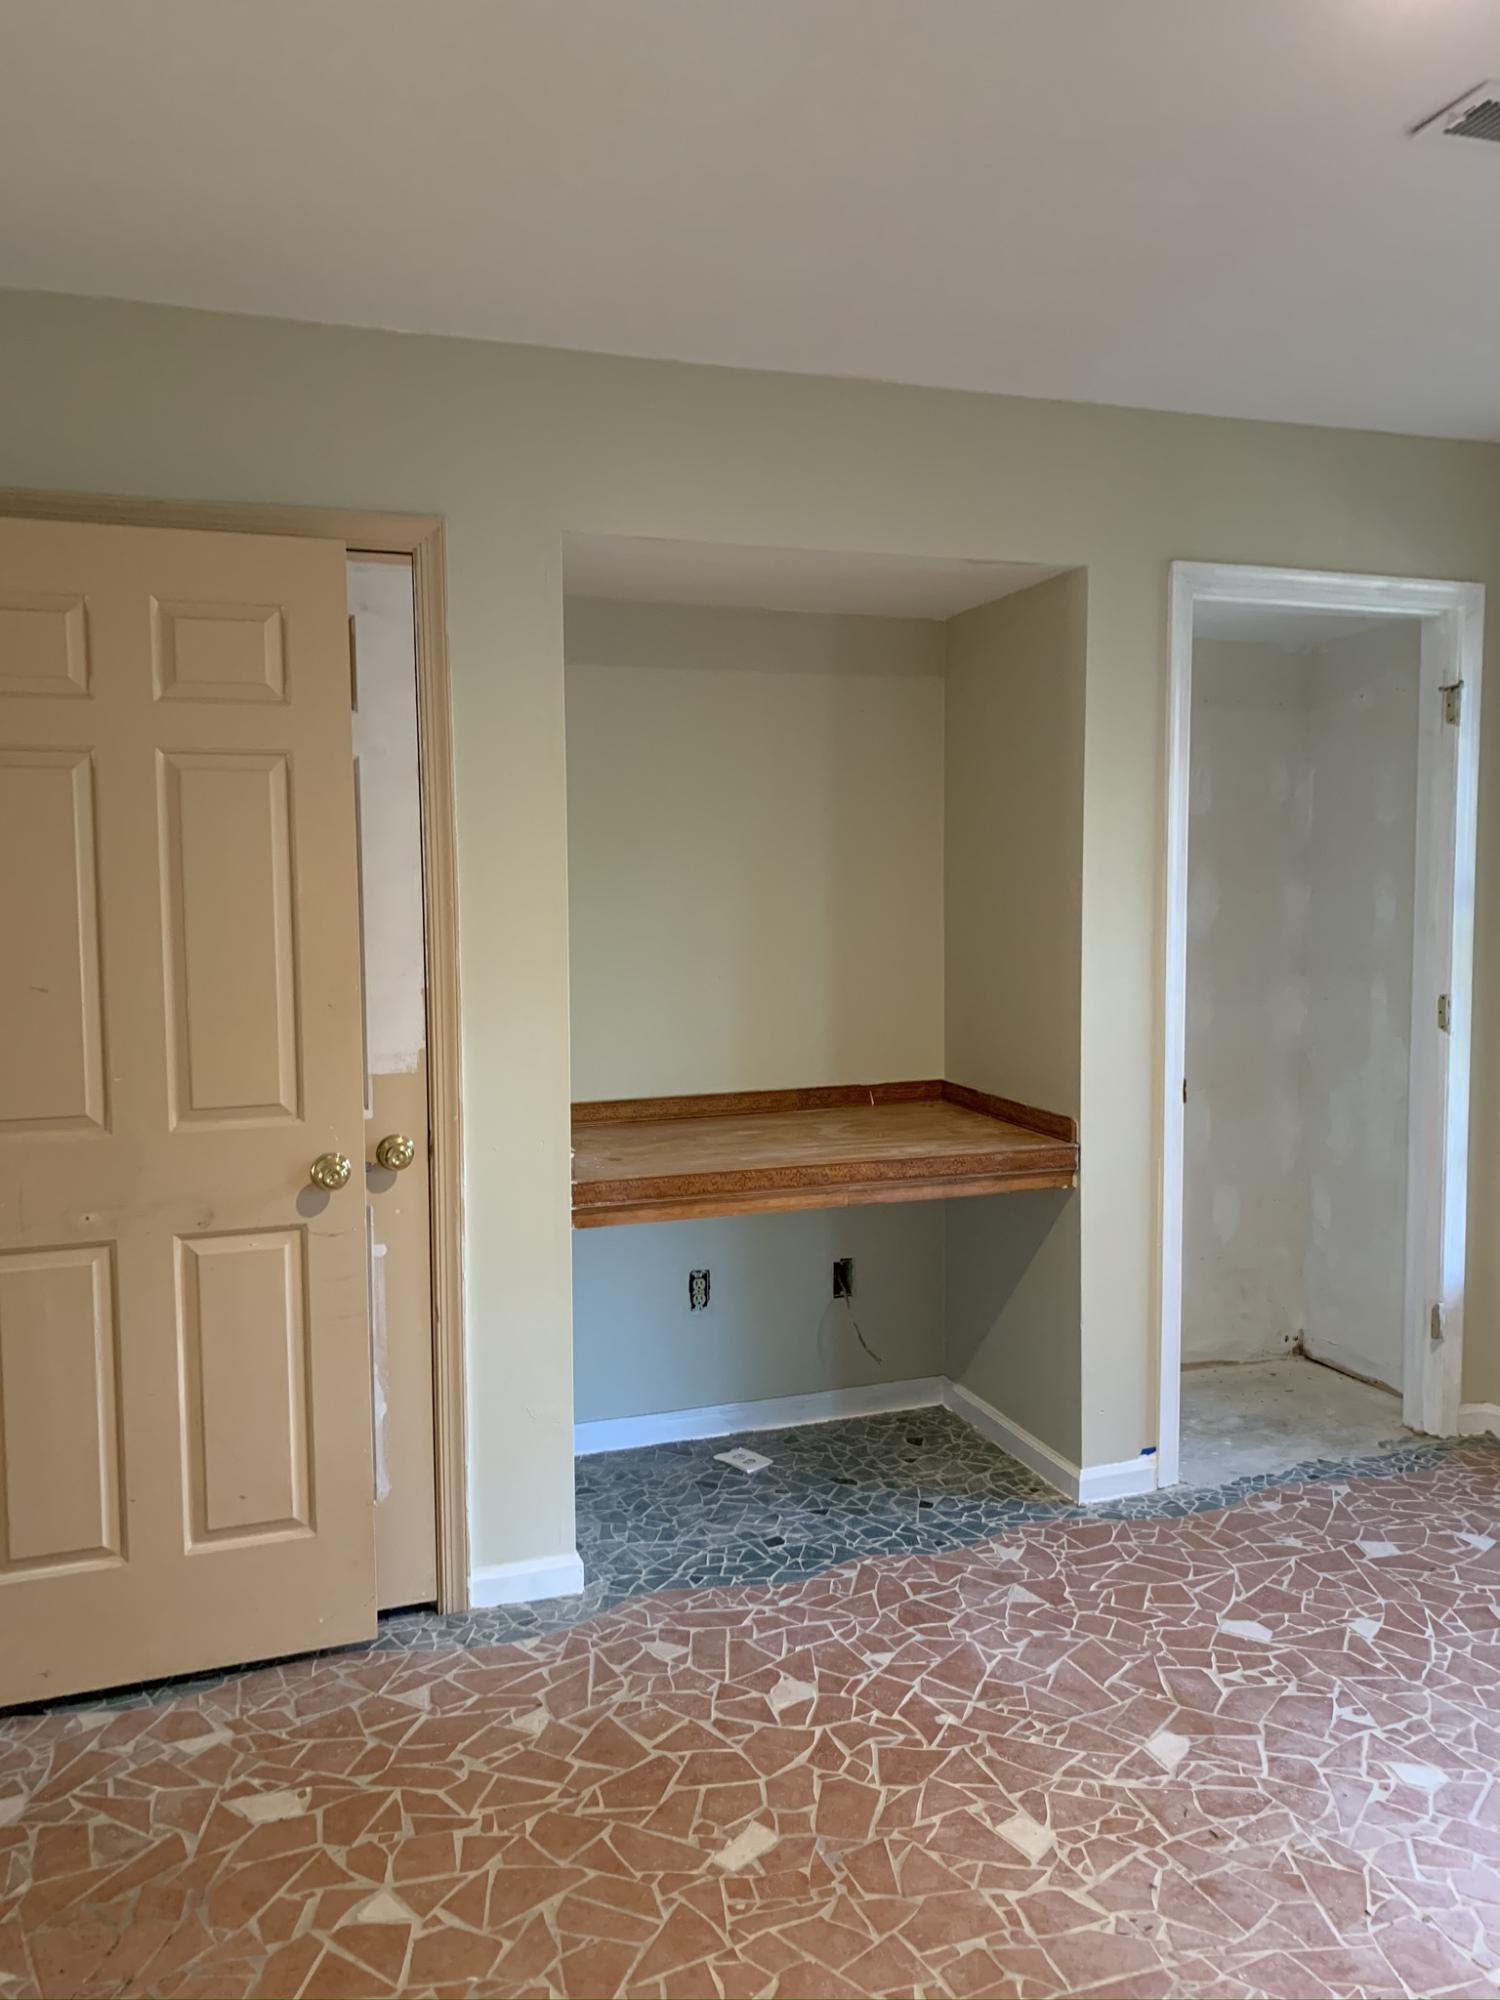 Fox Pond Homes For Sale - 662 Poaug, Mount Pleasant, SC - 4